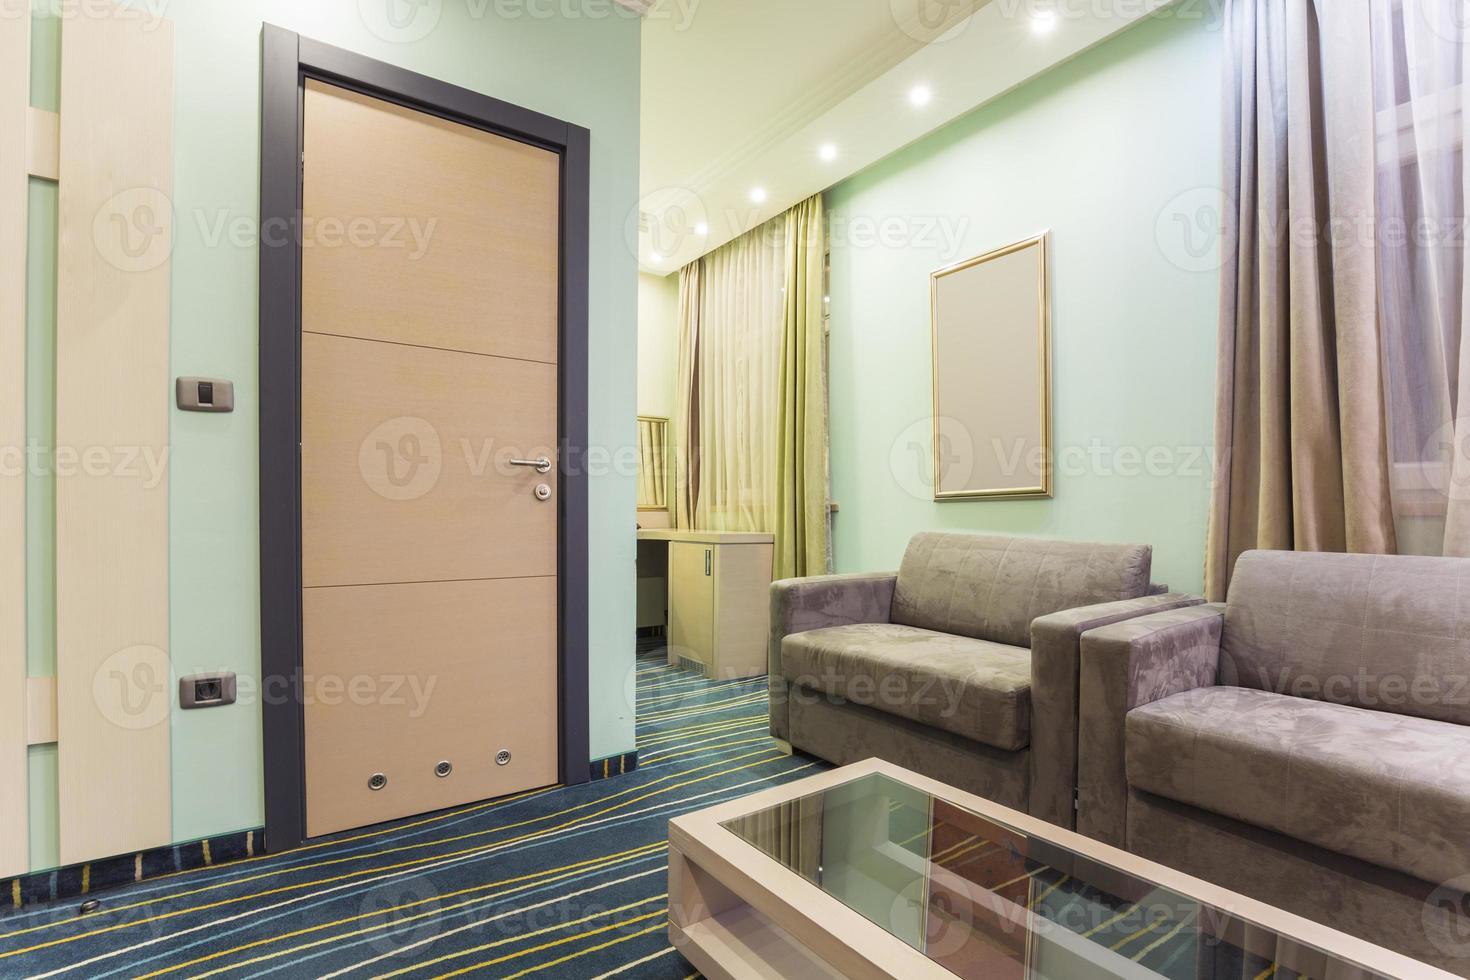 Hotel room interior photo